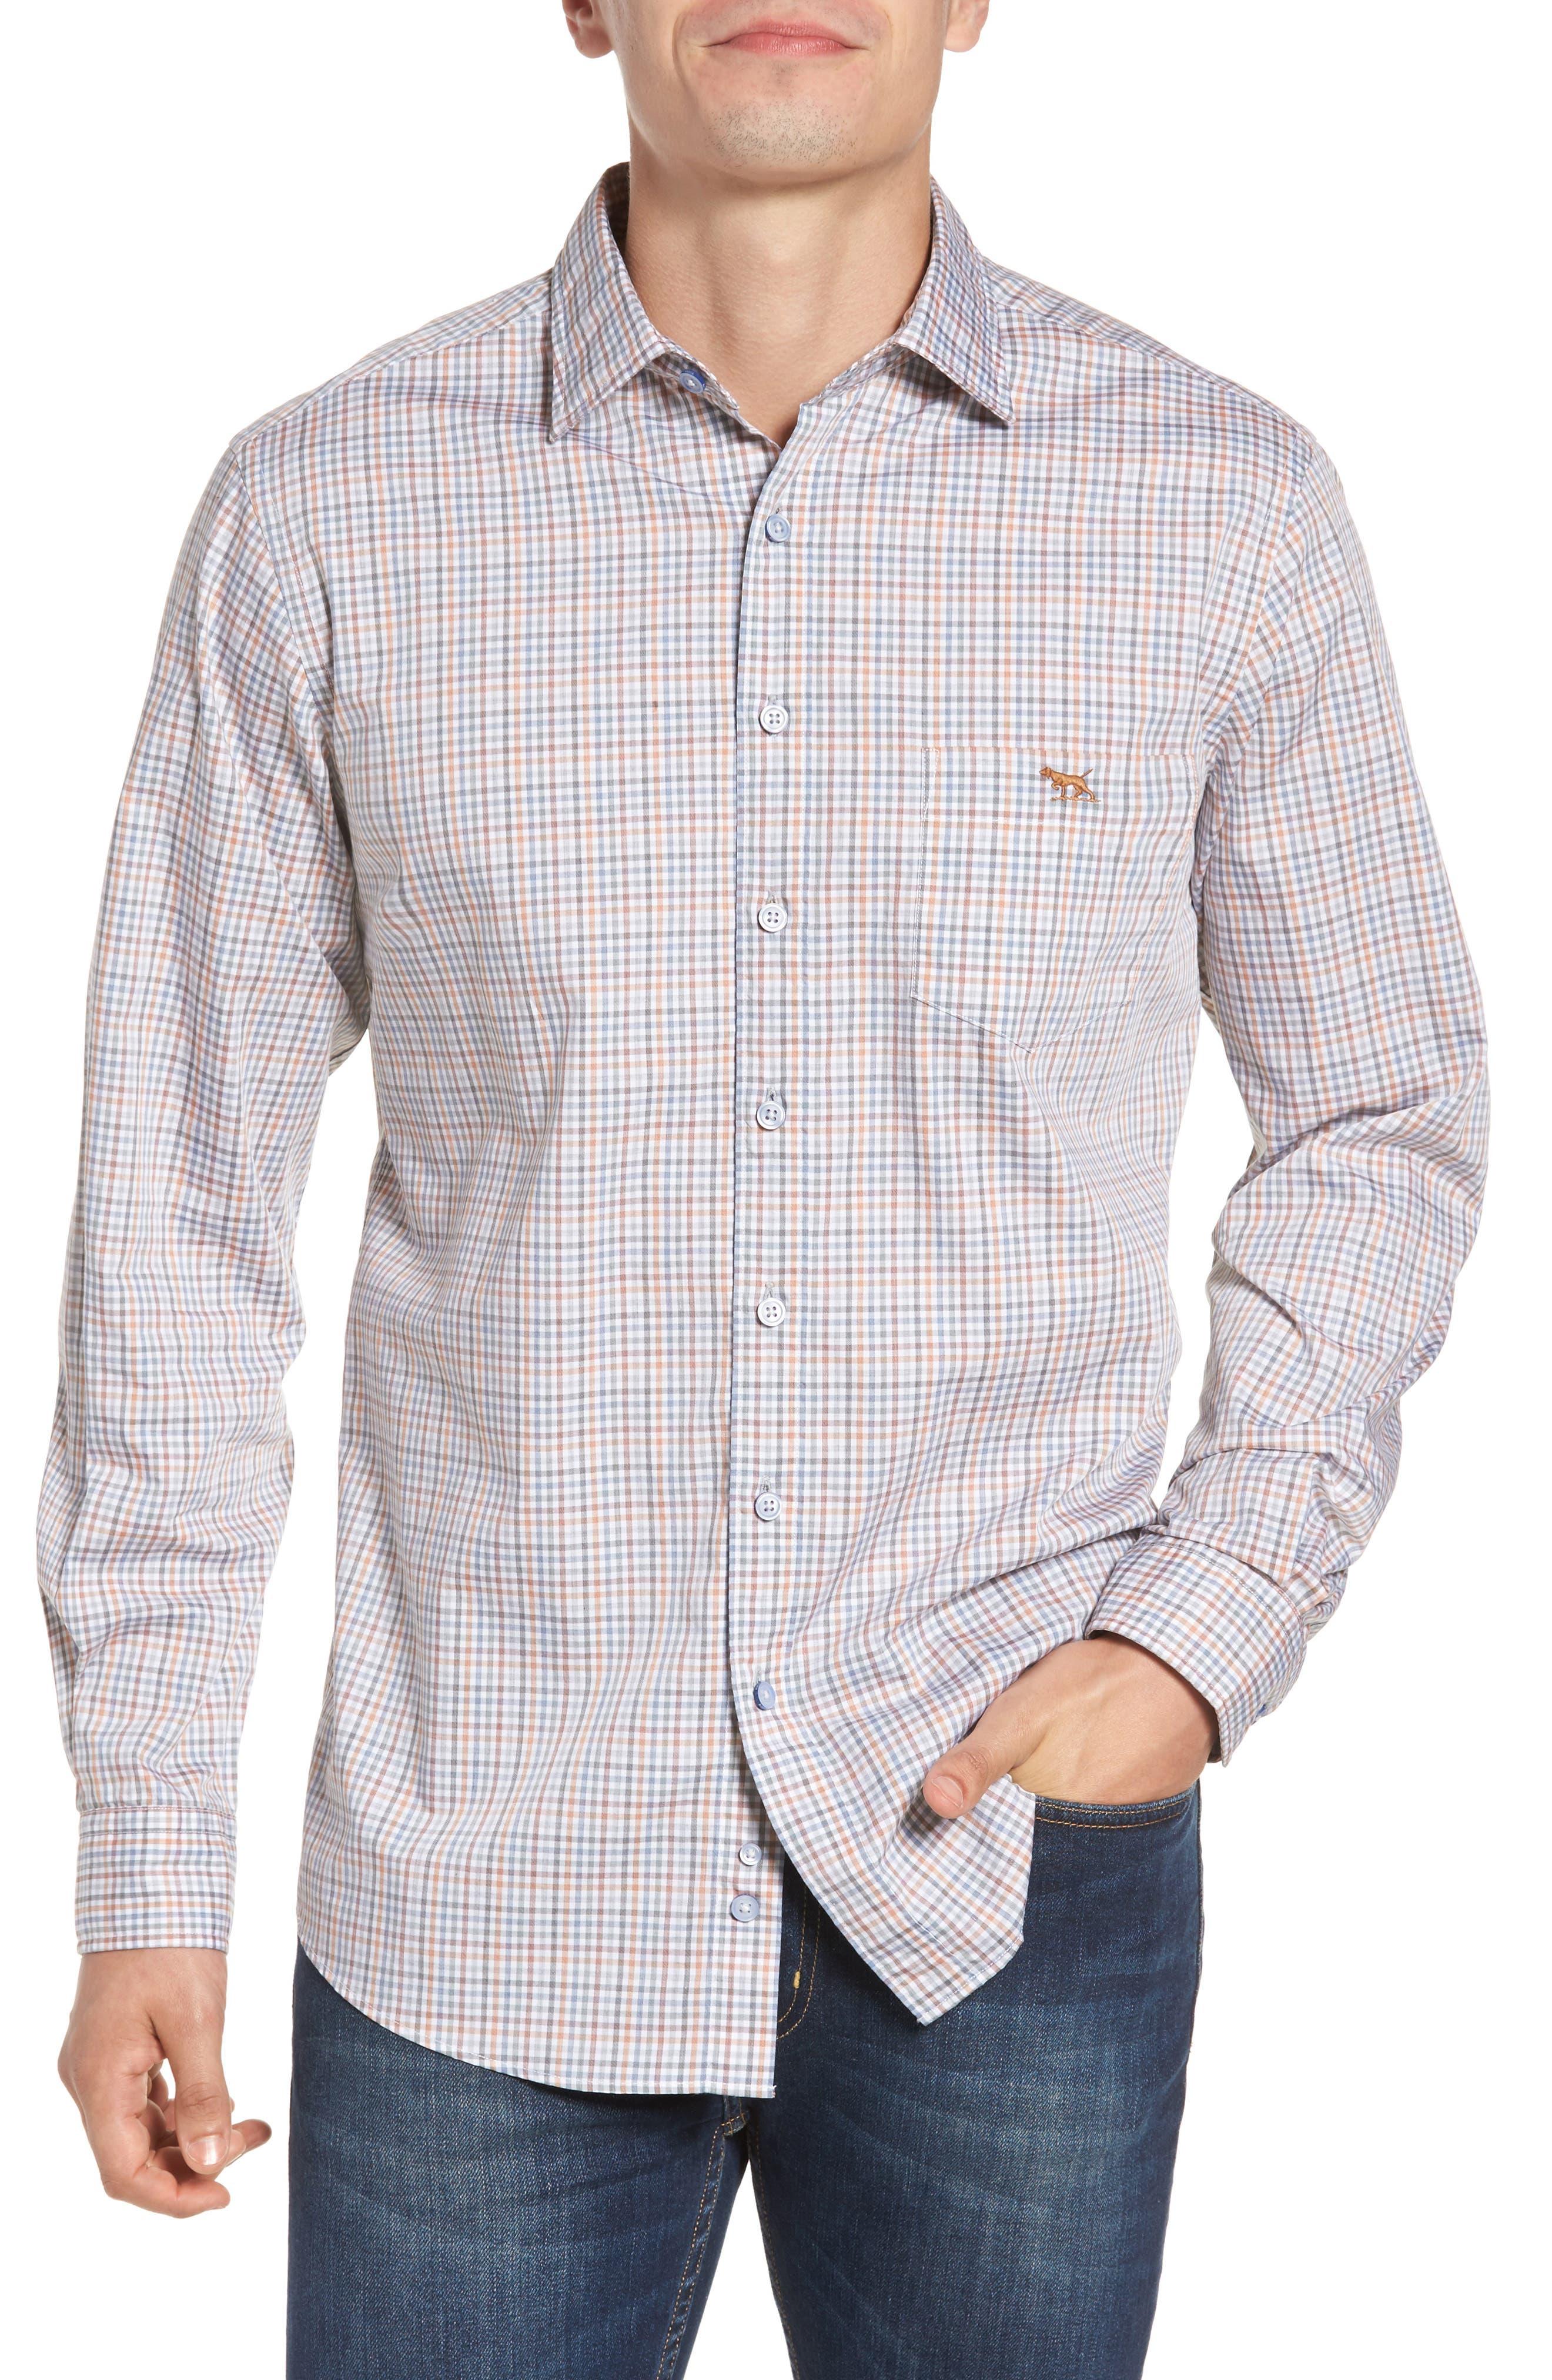 Woodlaw Original Fit Check Sport Shirt,                         Main,                         color,